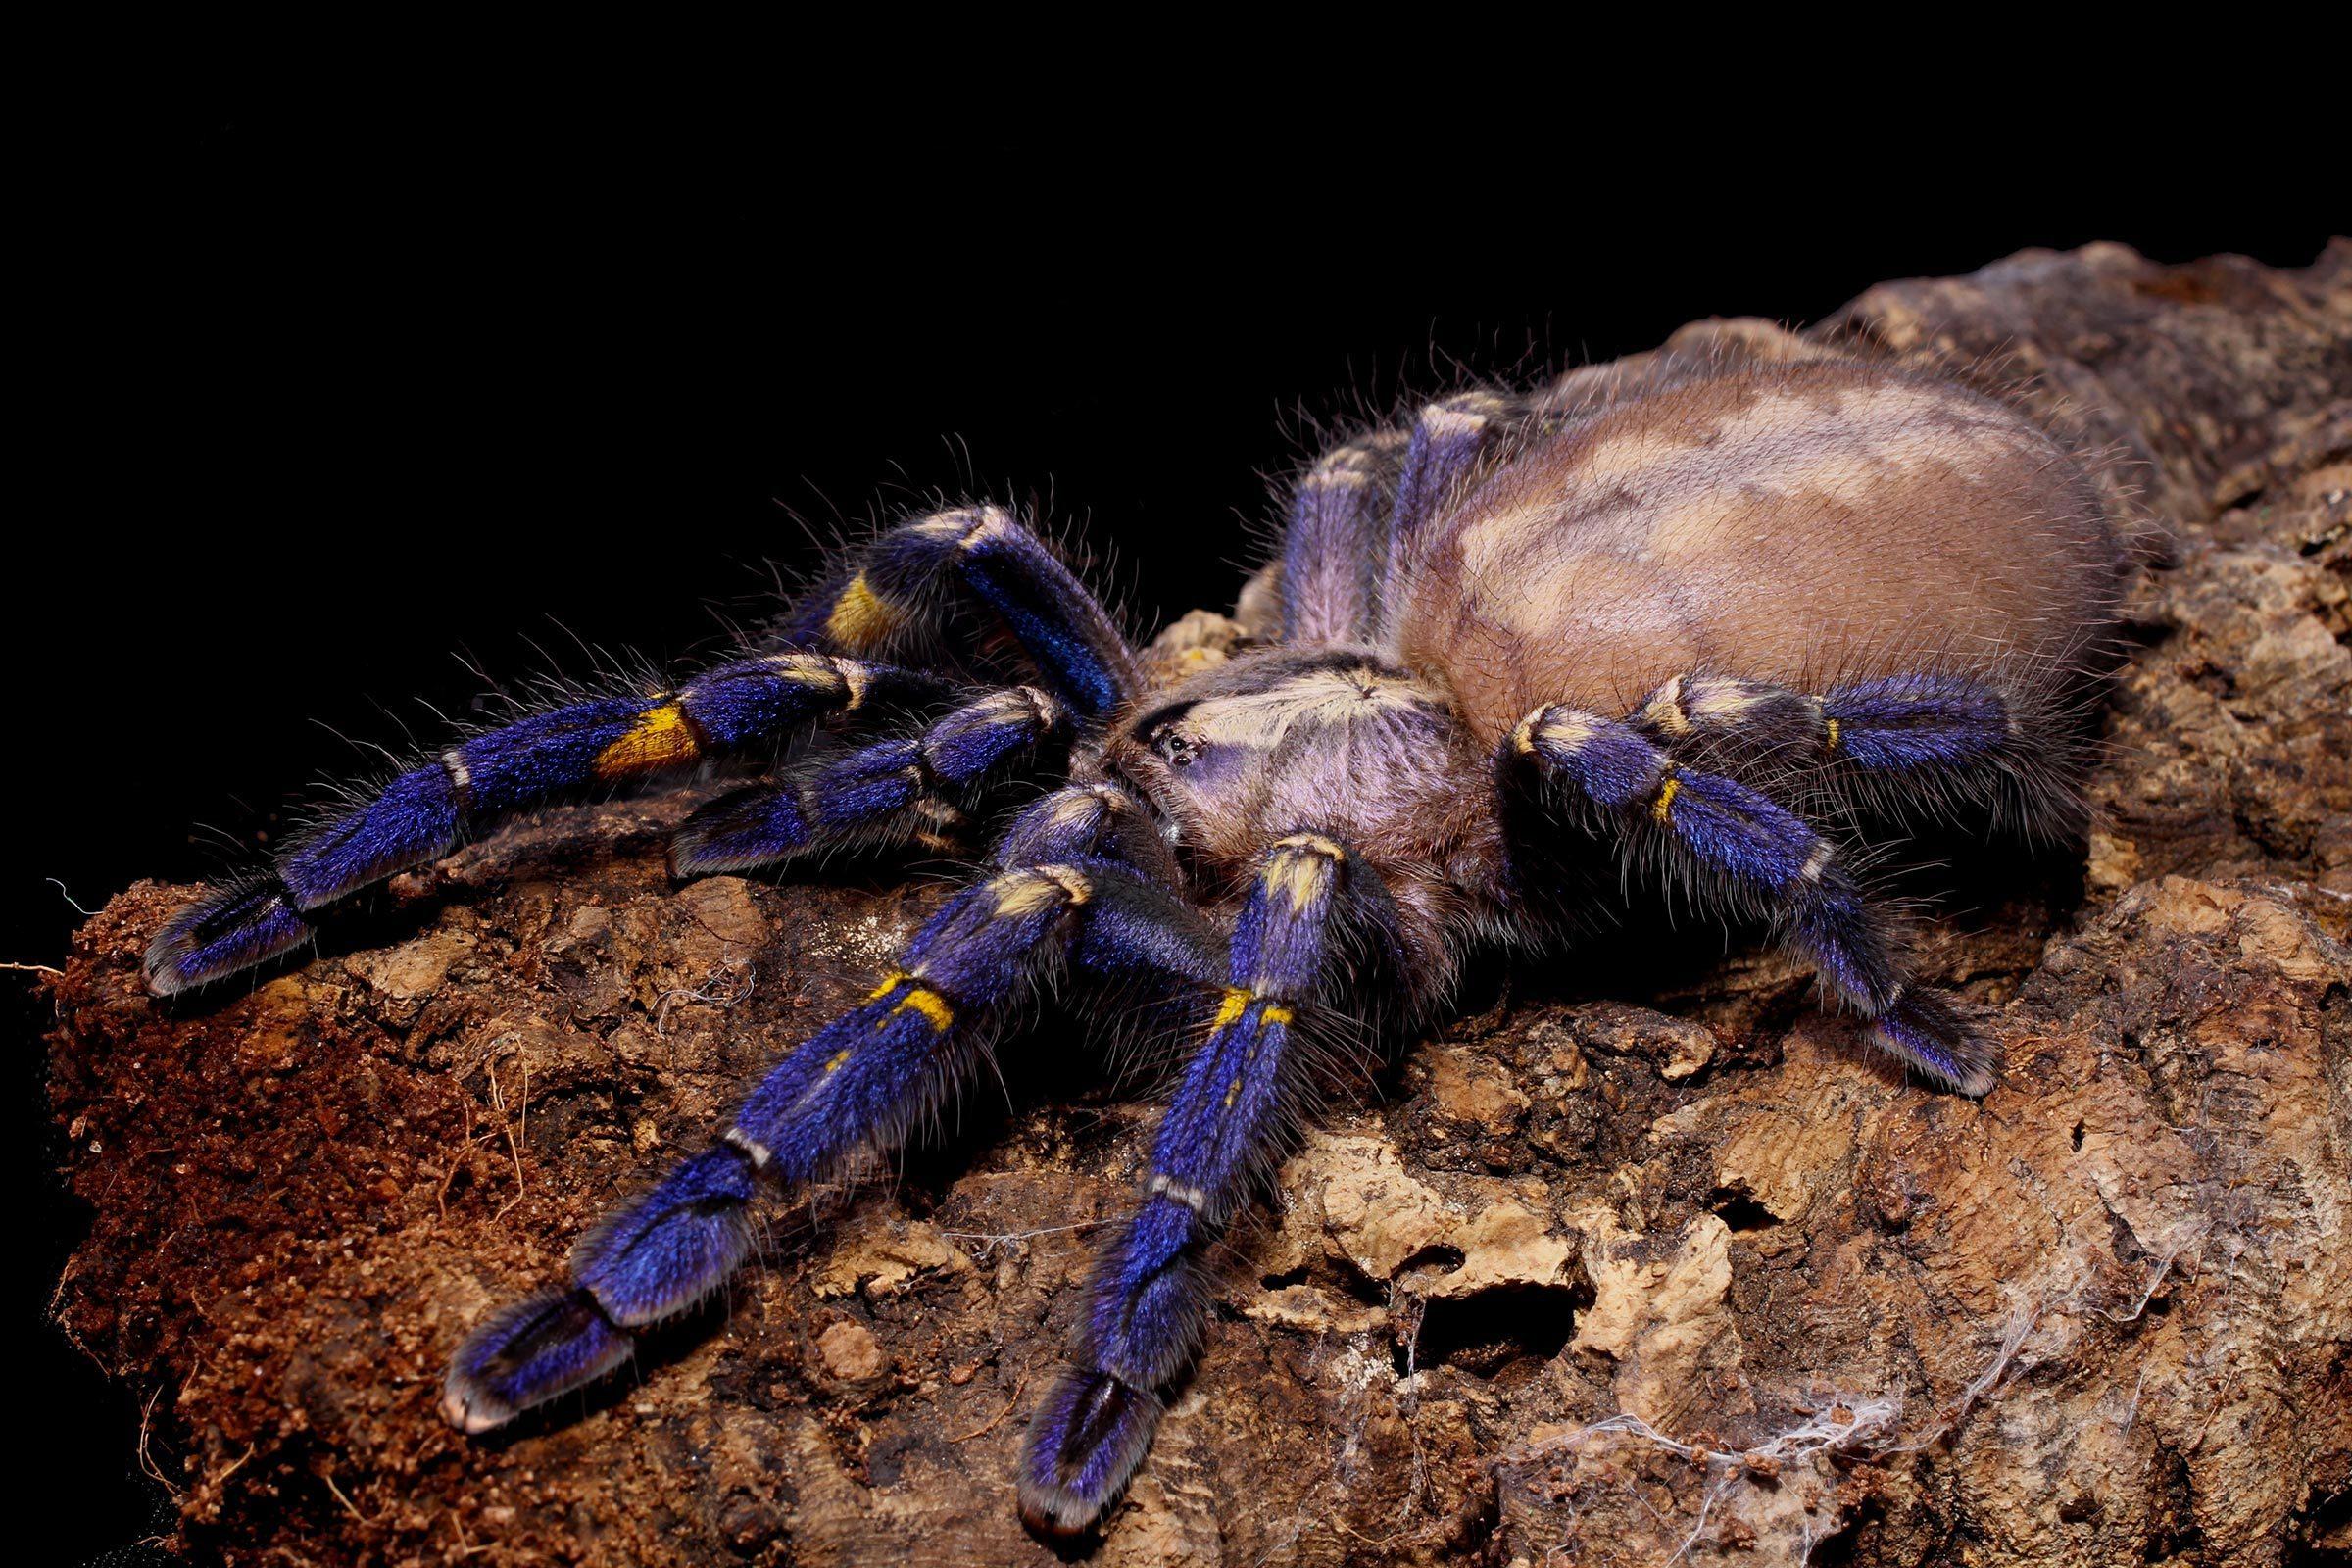 Espèces menacées : mygale ornementale saphir (Poecilotheria metallica)